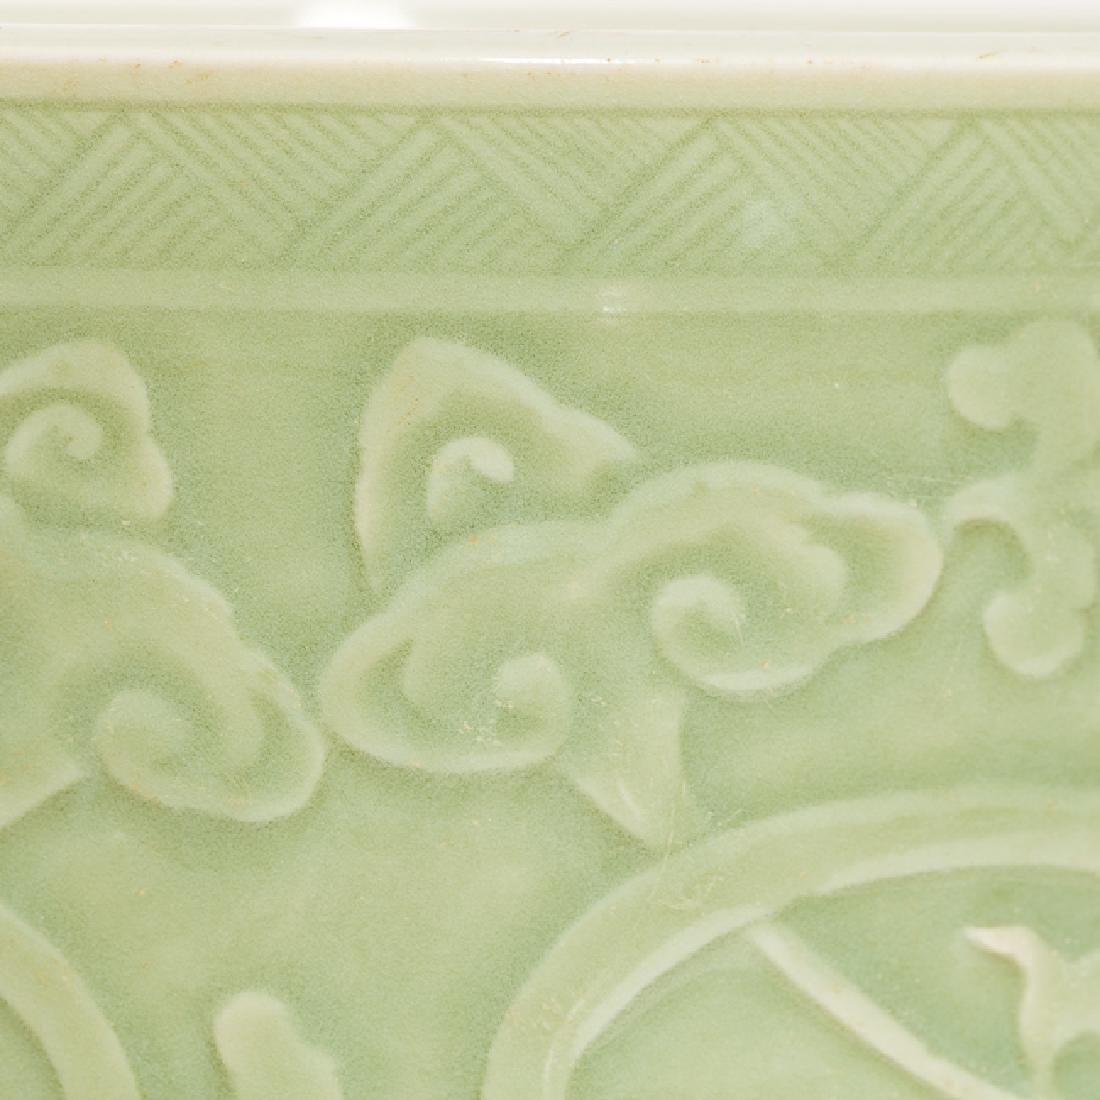 Chinese Antique Celadon Brush Washer, Qing Dynasty - 9